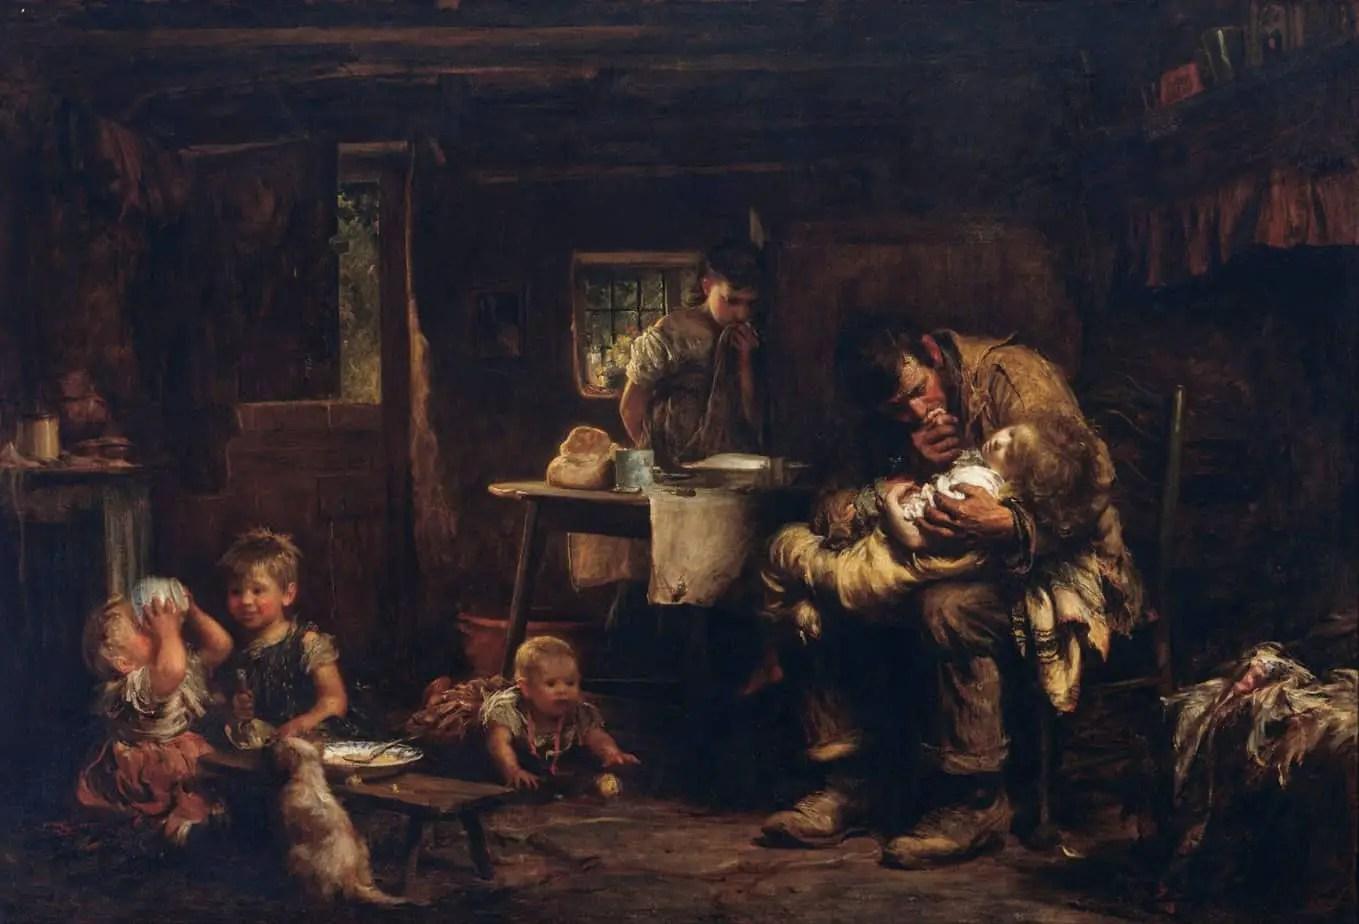 Sir Luke Fildes - The Widower 1875-76